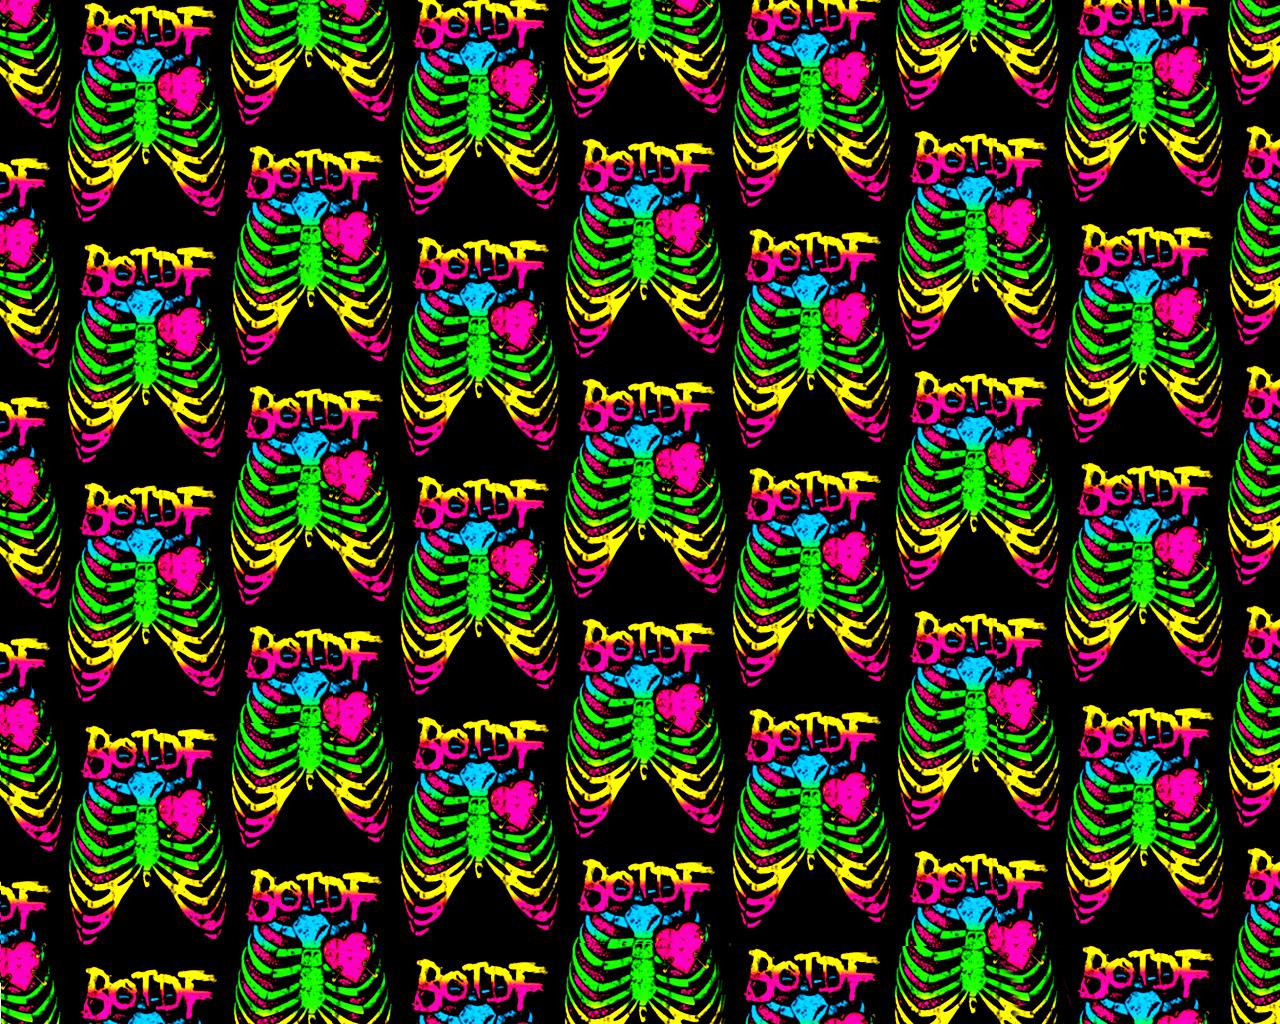 Blood On The Dancefloor HD wallpaper   ForWallpapercom 1280x1024